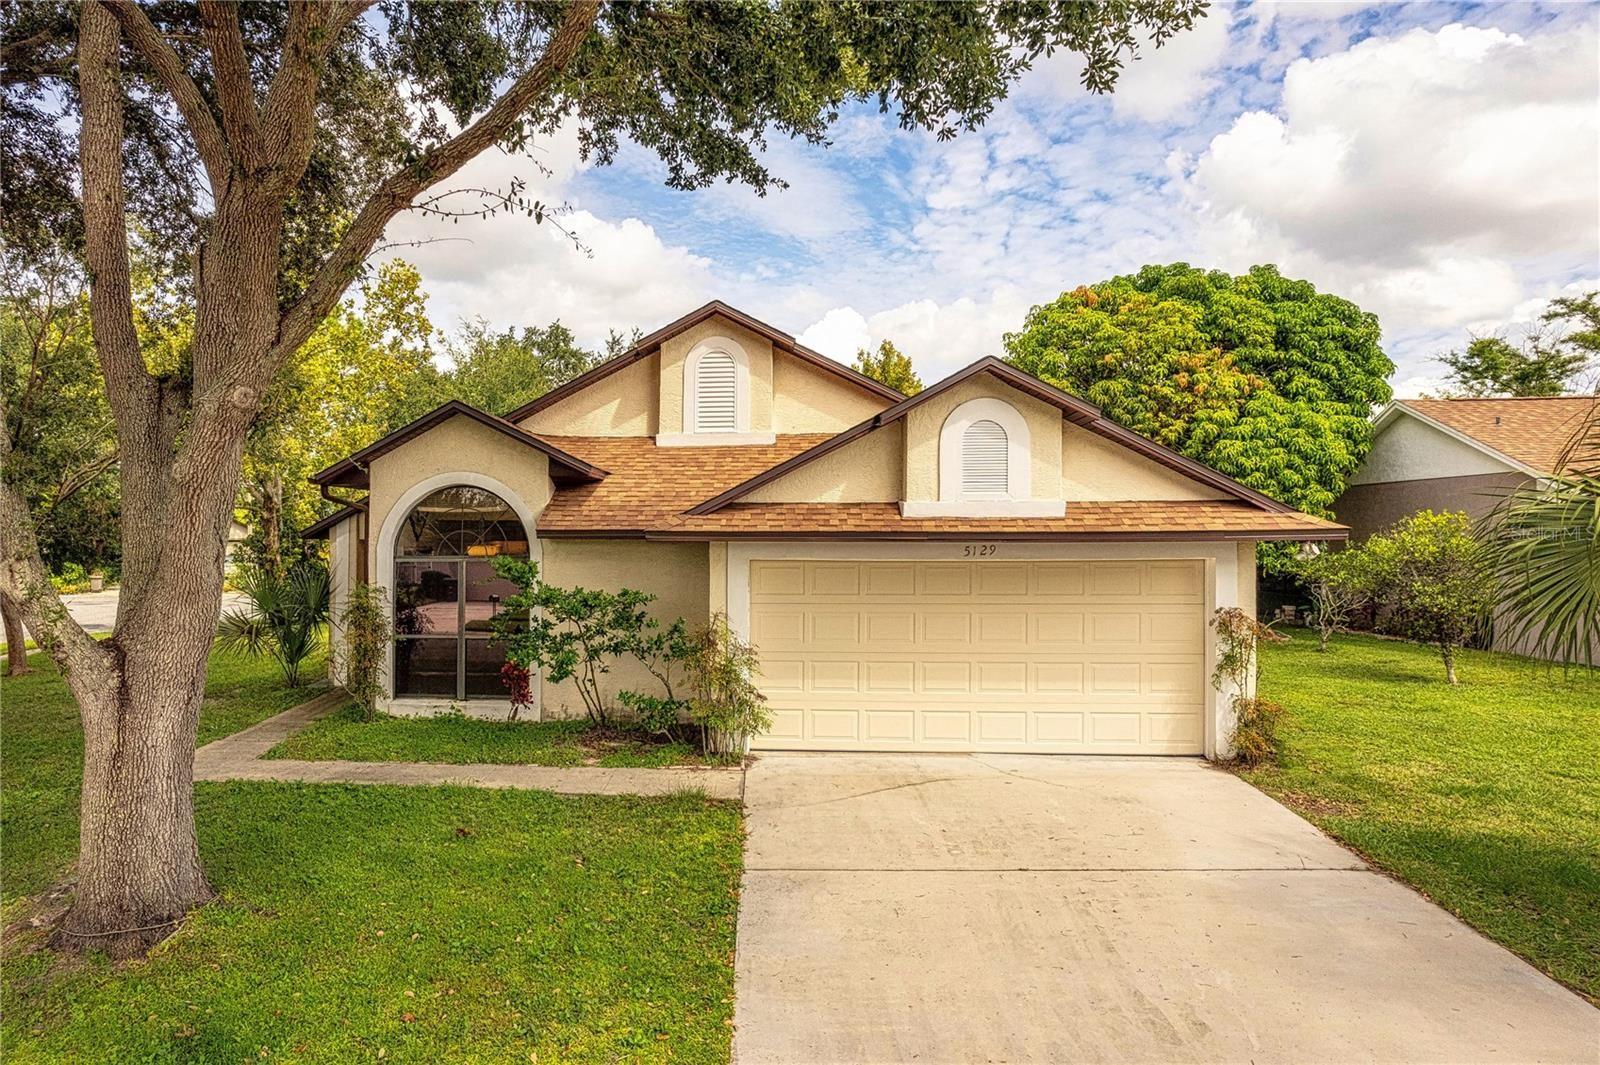 5129 DORRINGTON LANE, Orlando, FL 32821 - #: V4921198